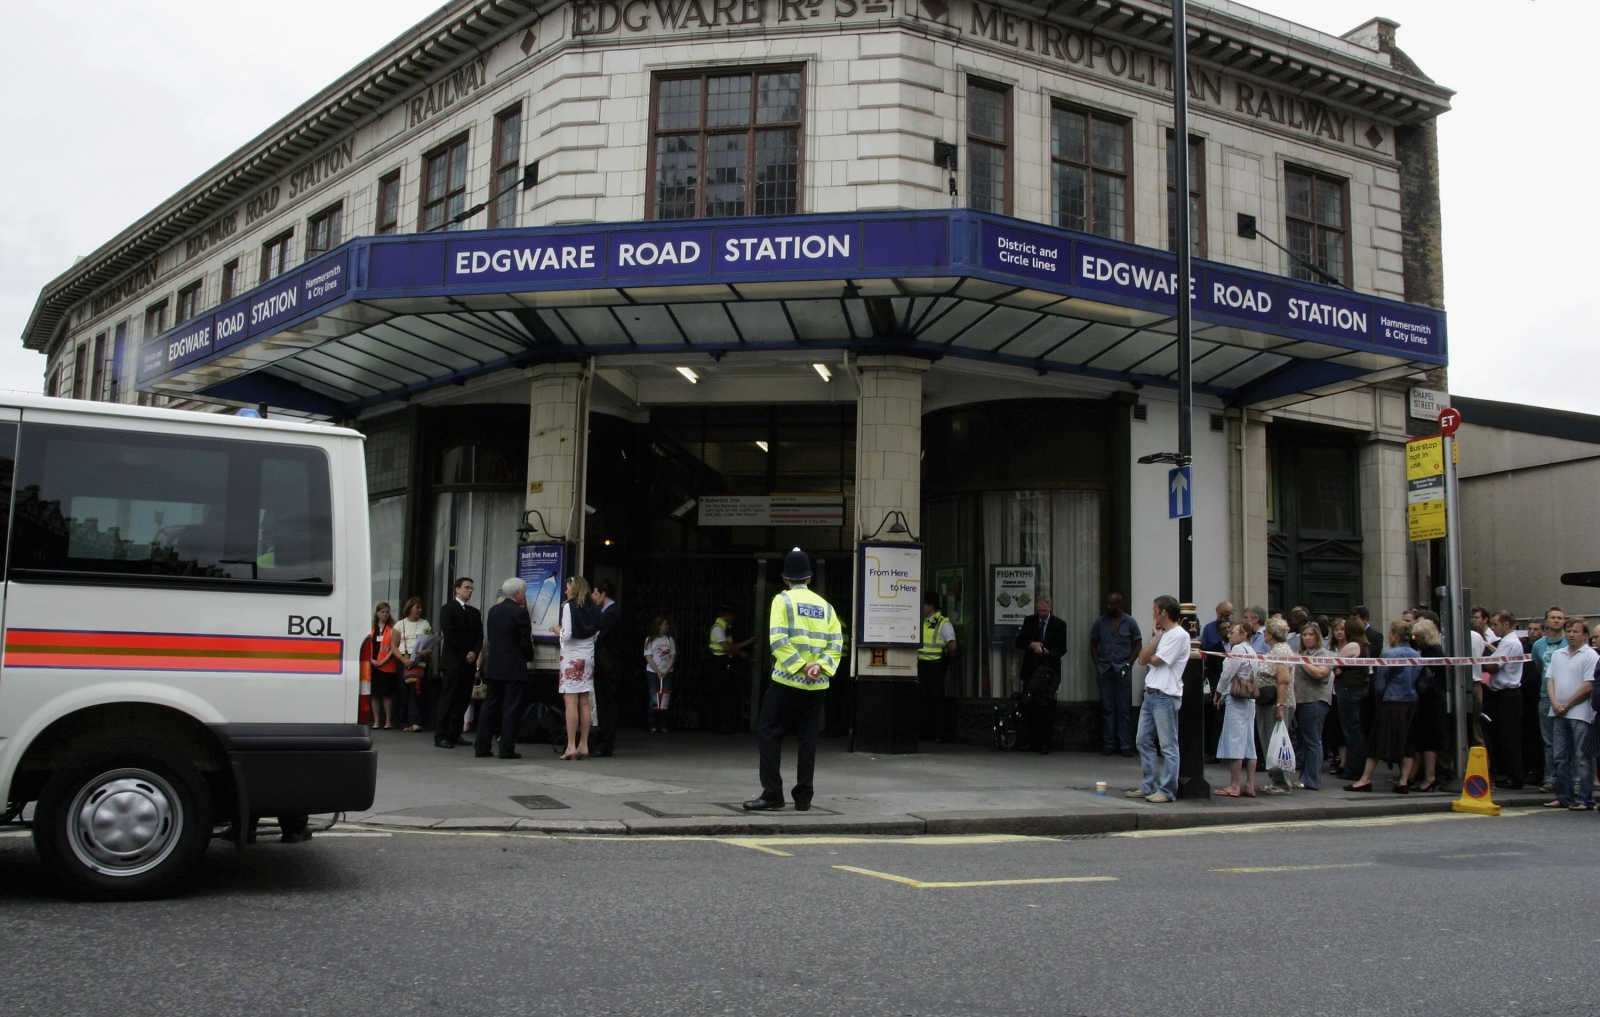 edgeware road station